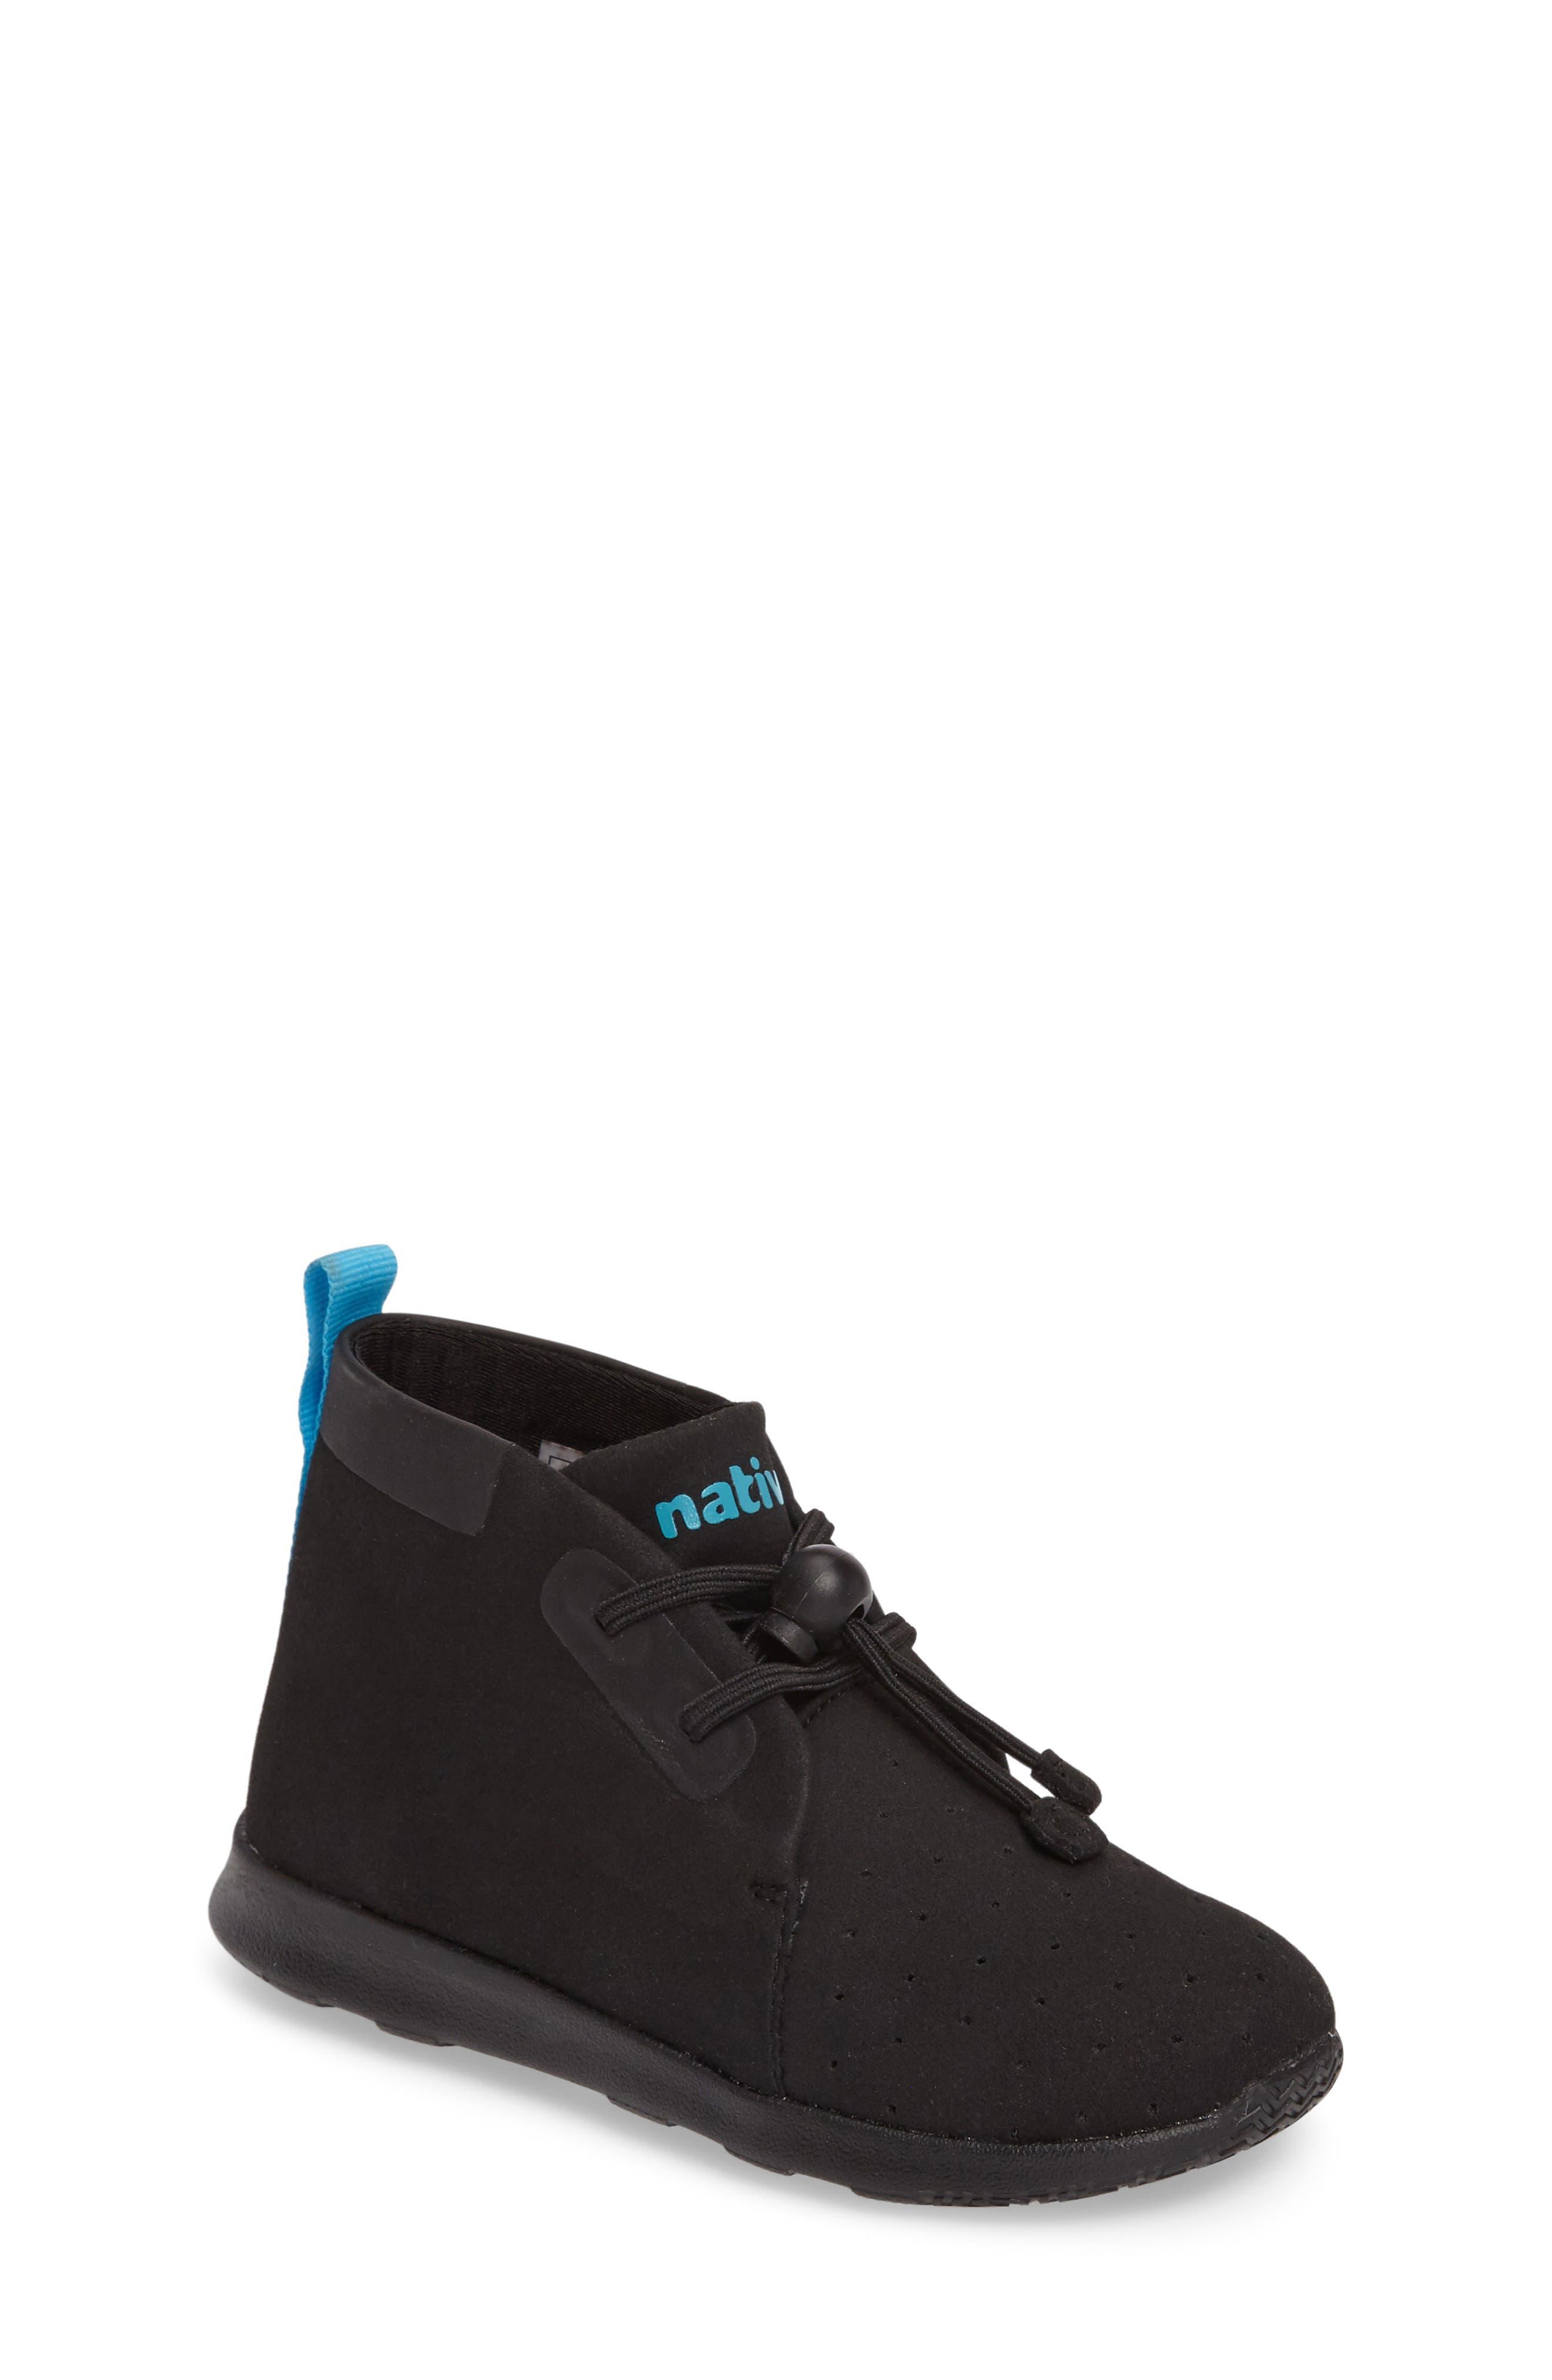 Chukka Boot,                         Main,                         color, 002